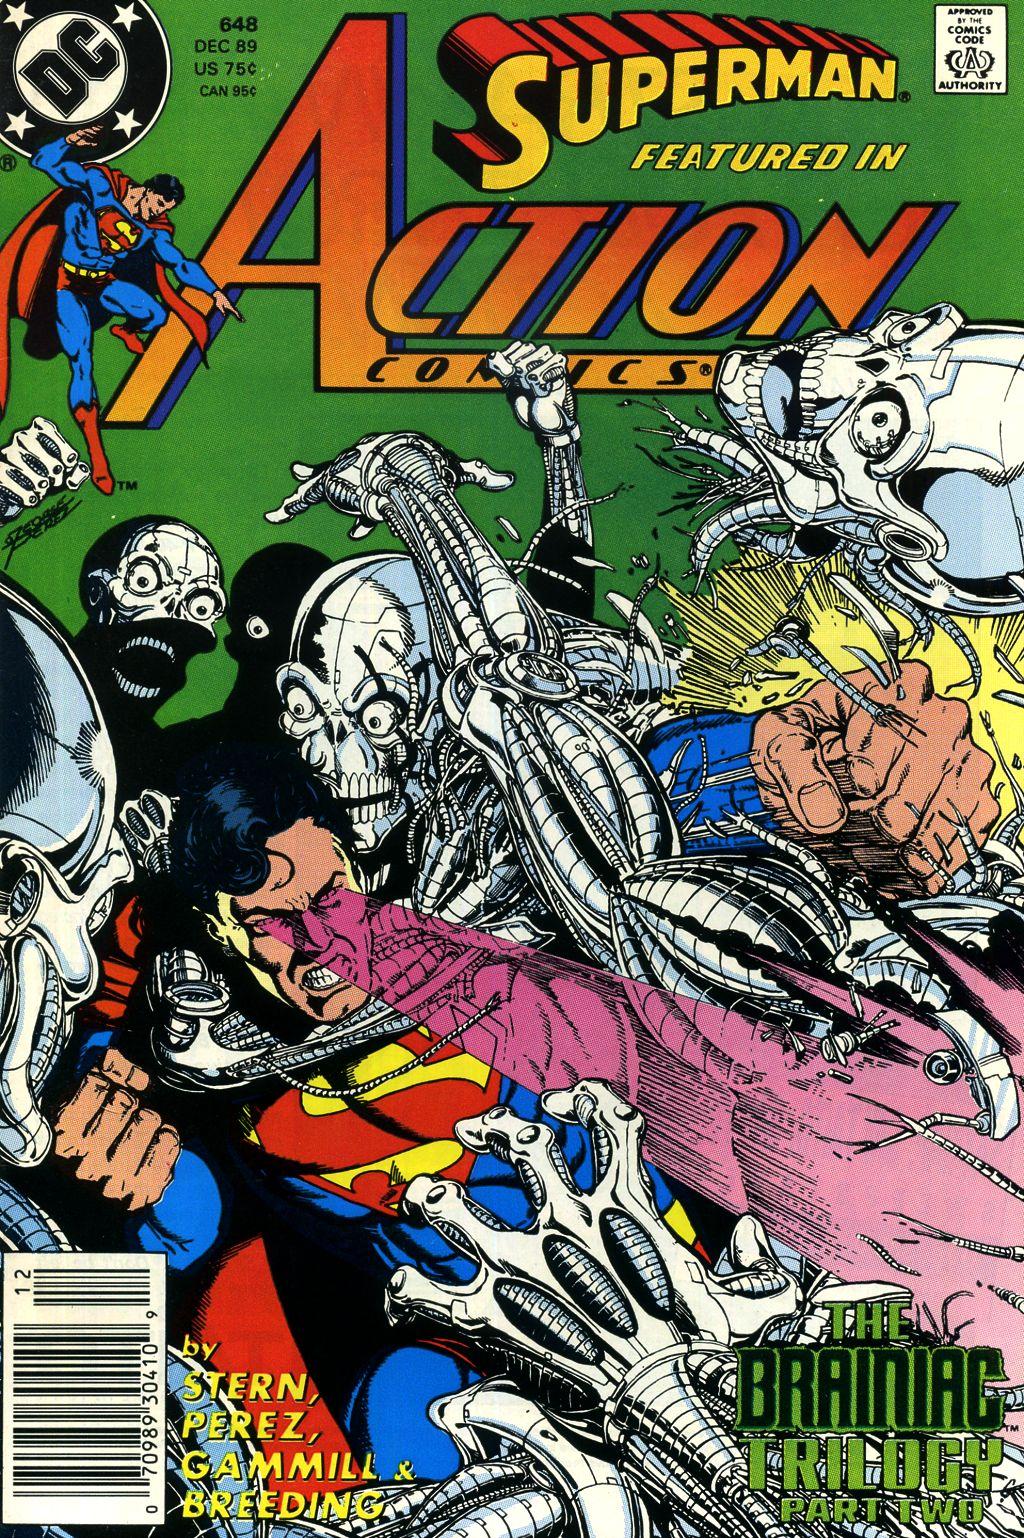 Action Comics (1938) 648 Page 1